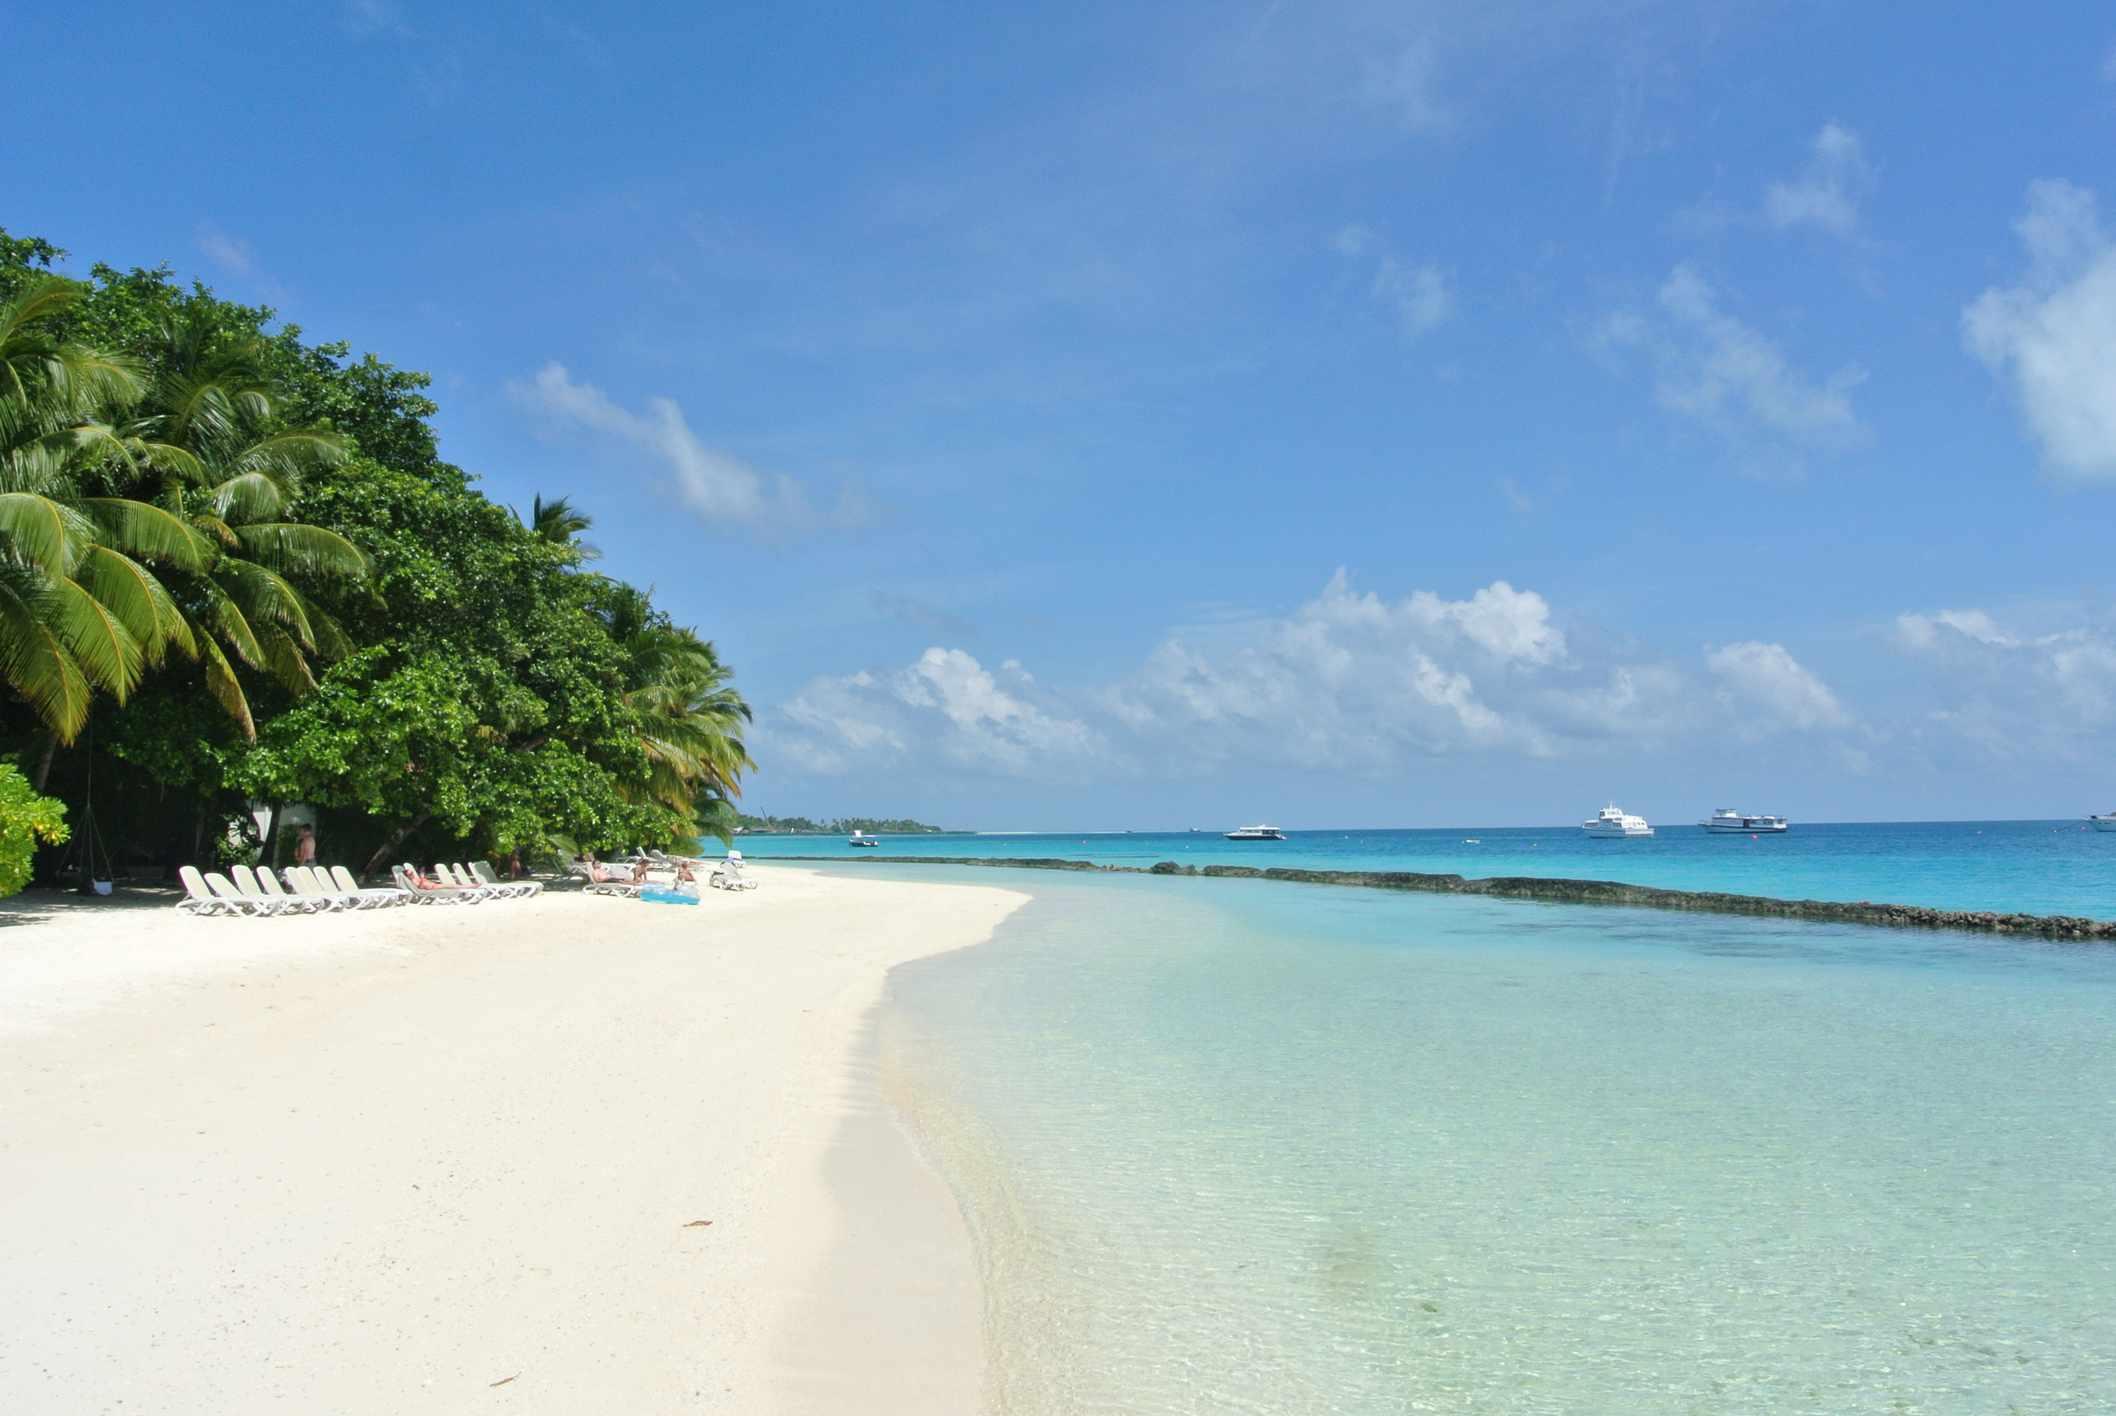 White sand beach at Kuramathi island in the Maldives